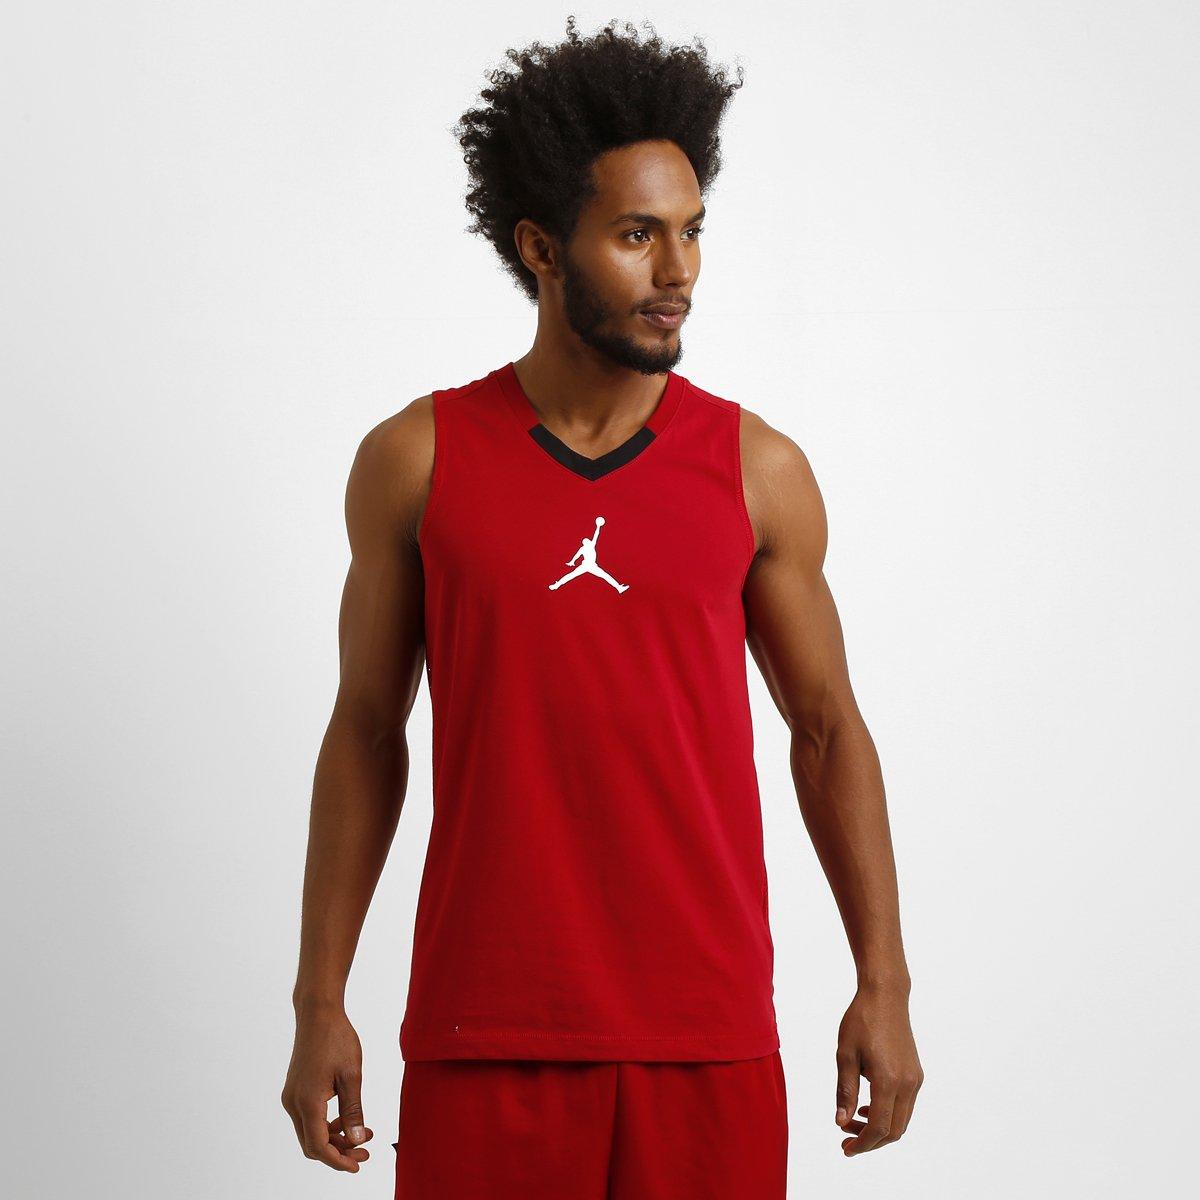 Camiseta Regata Nike Jordan Rise - Compre Agora  8e4237cd366